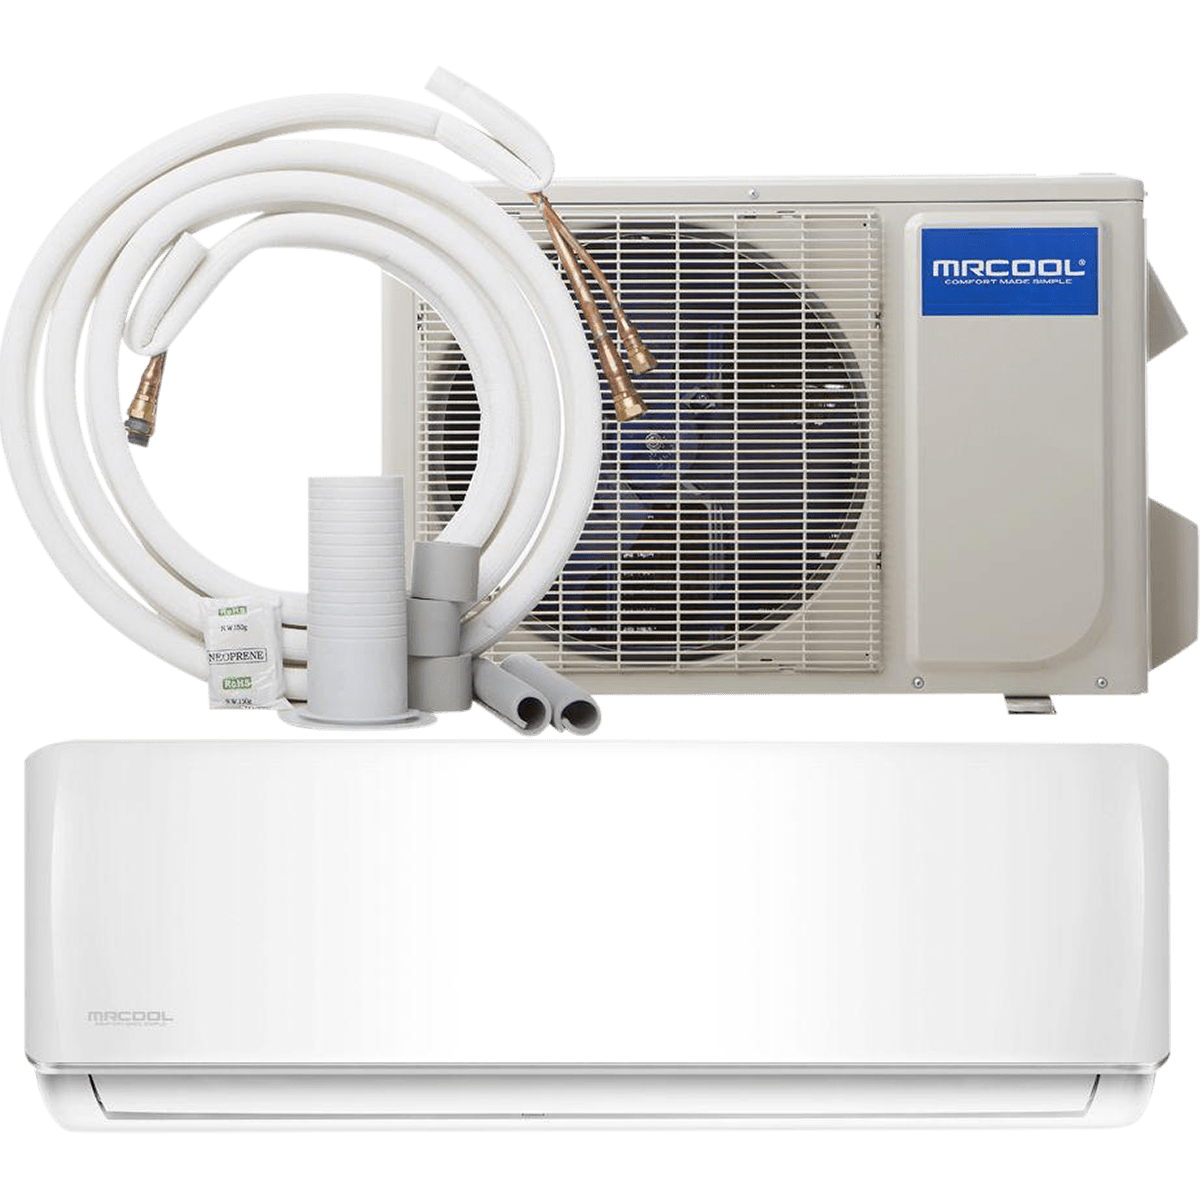 MRCOOL DIY 12,000 BTU 115V Mini Split Heat Pump | Sylvane